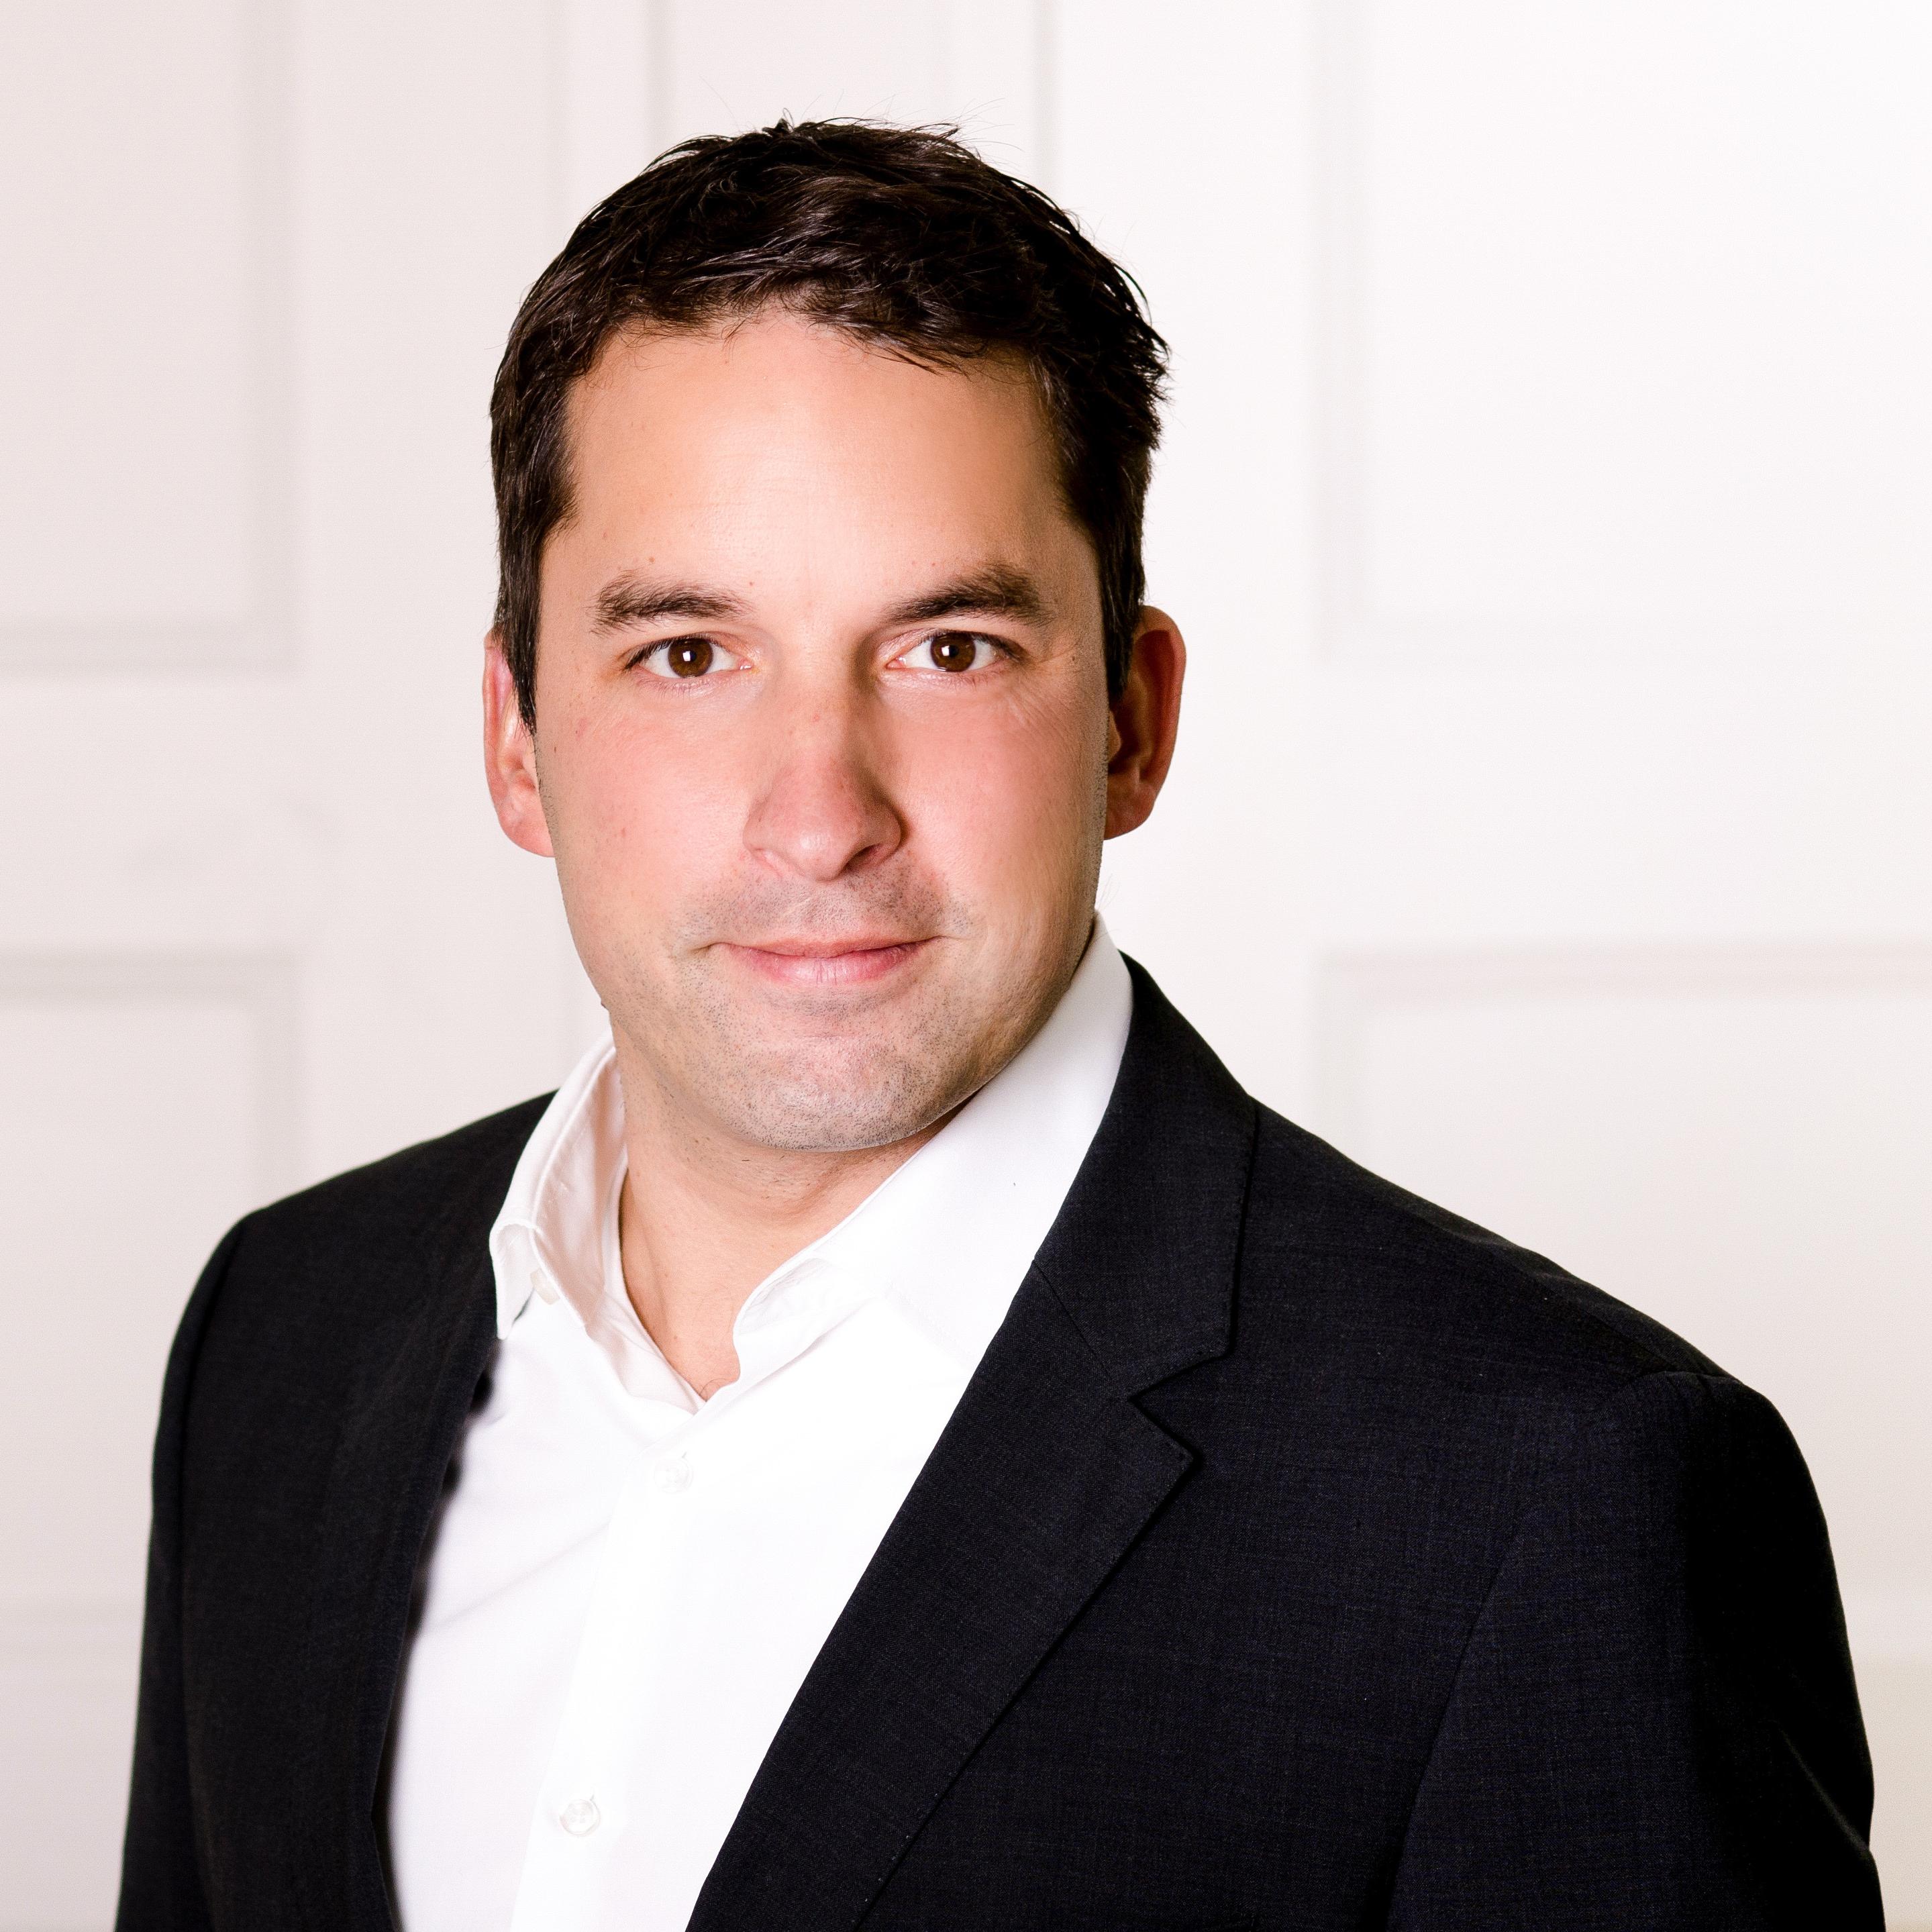 Zoltan Elek, Founder & Managing Director at LW Capital GmbH